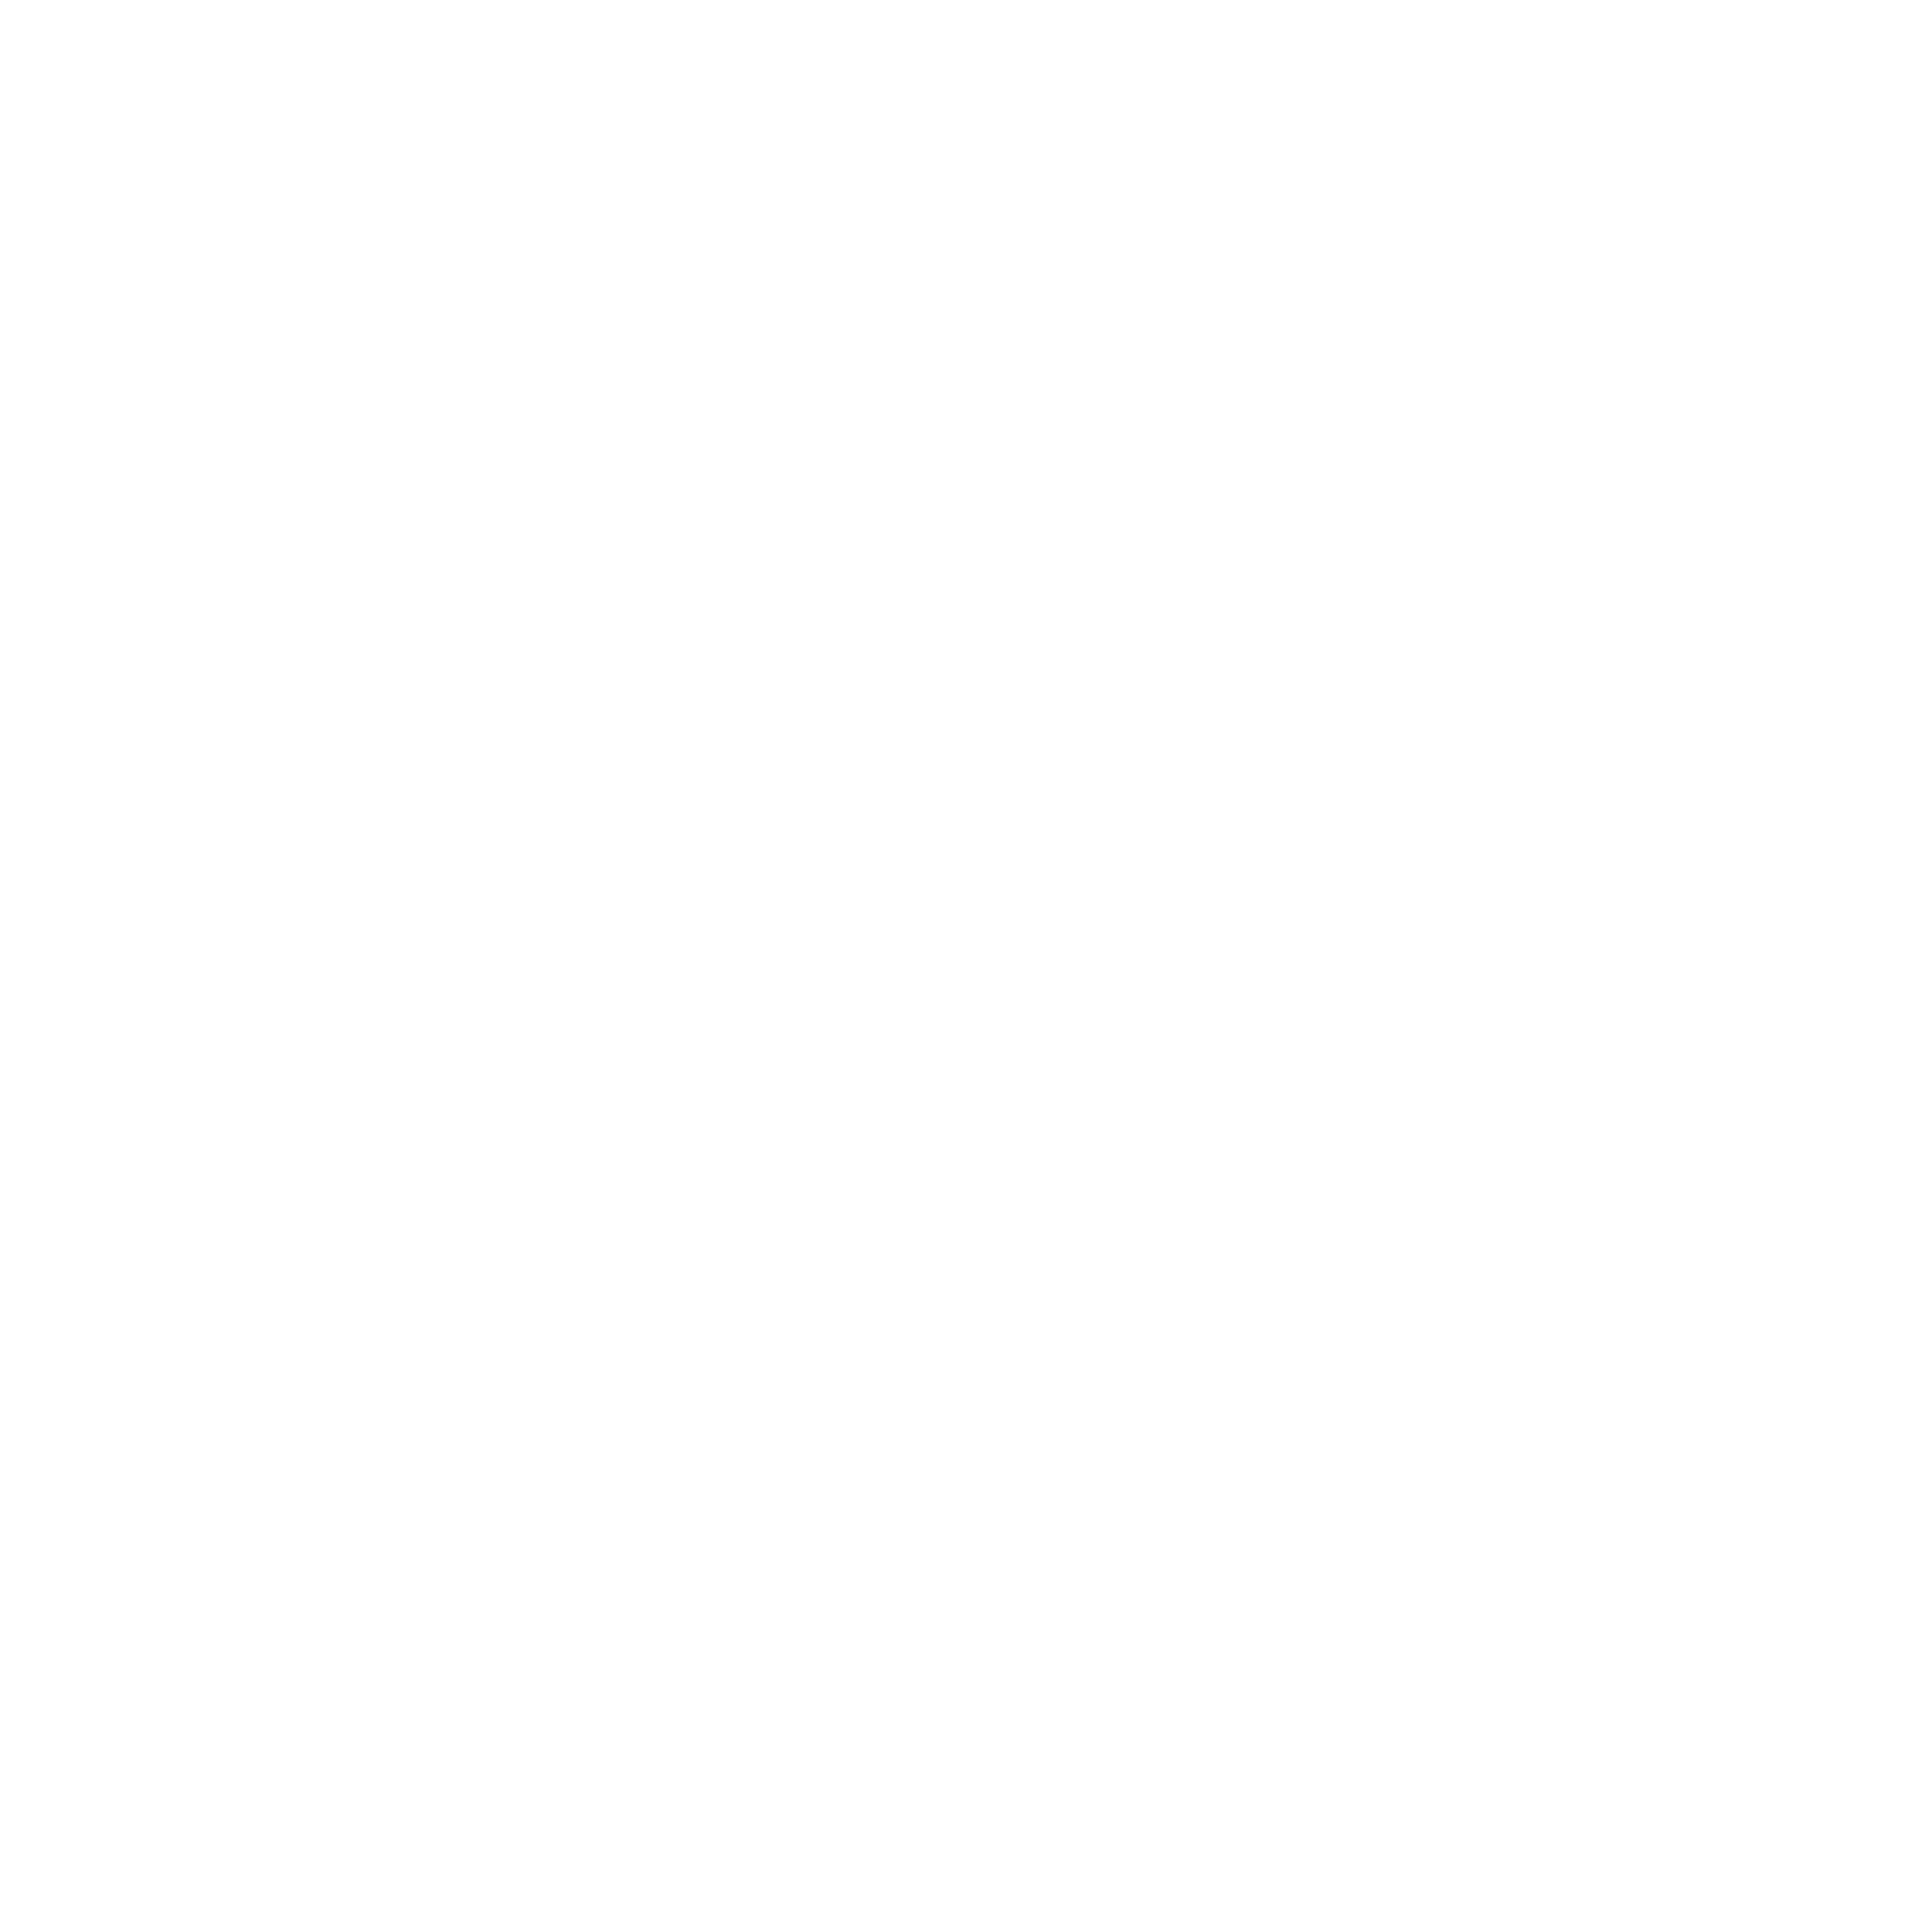 http://www.munezstudio.com/web-development/